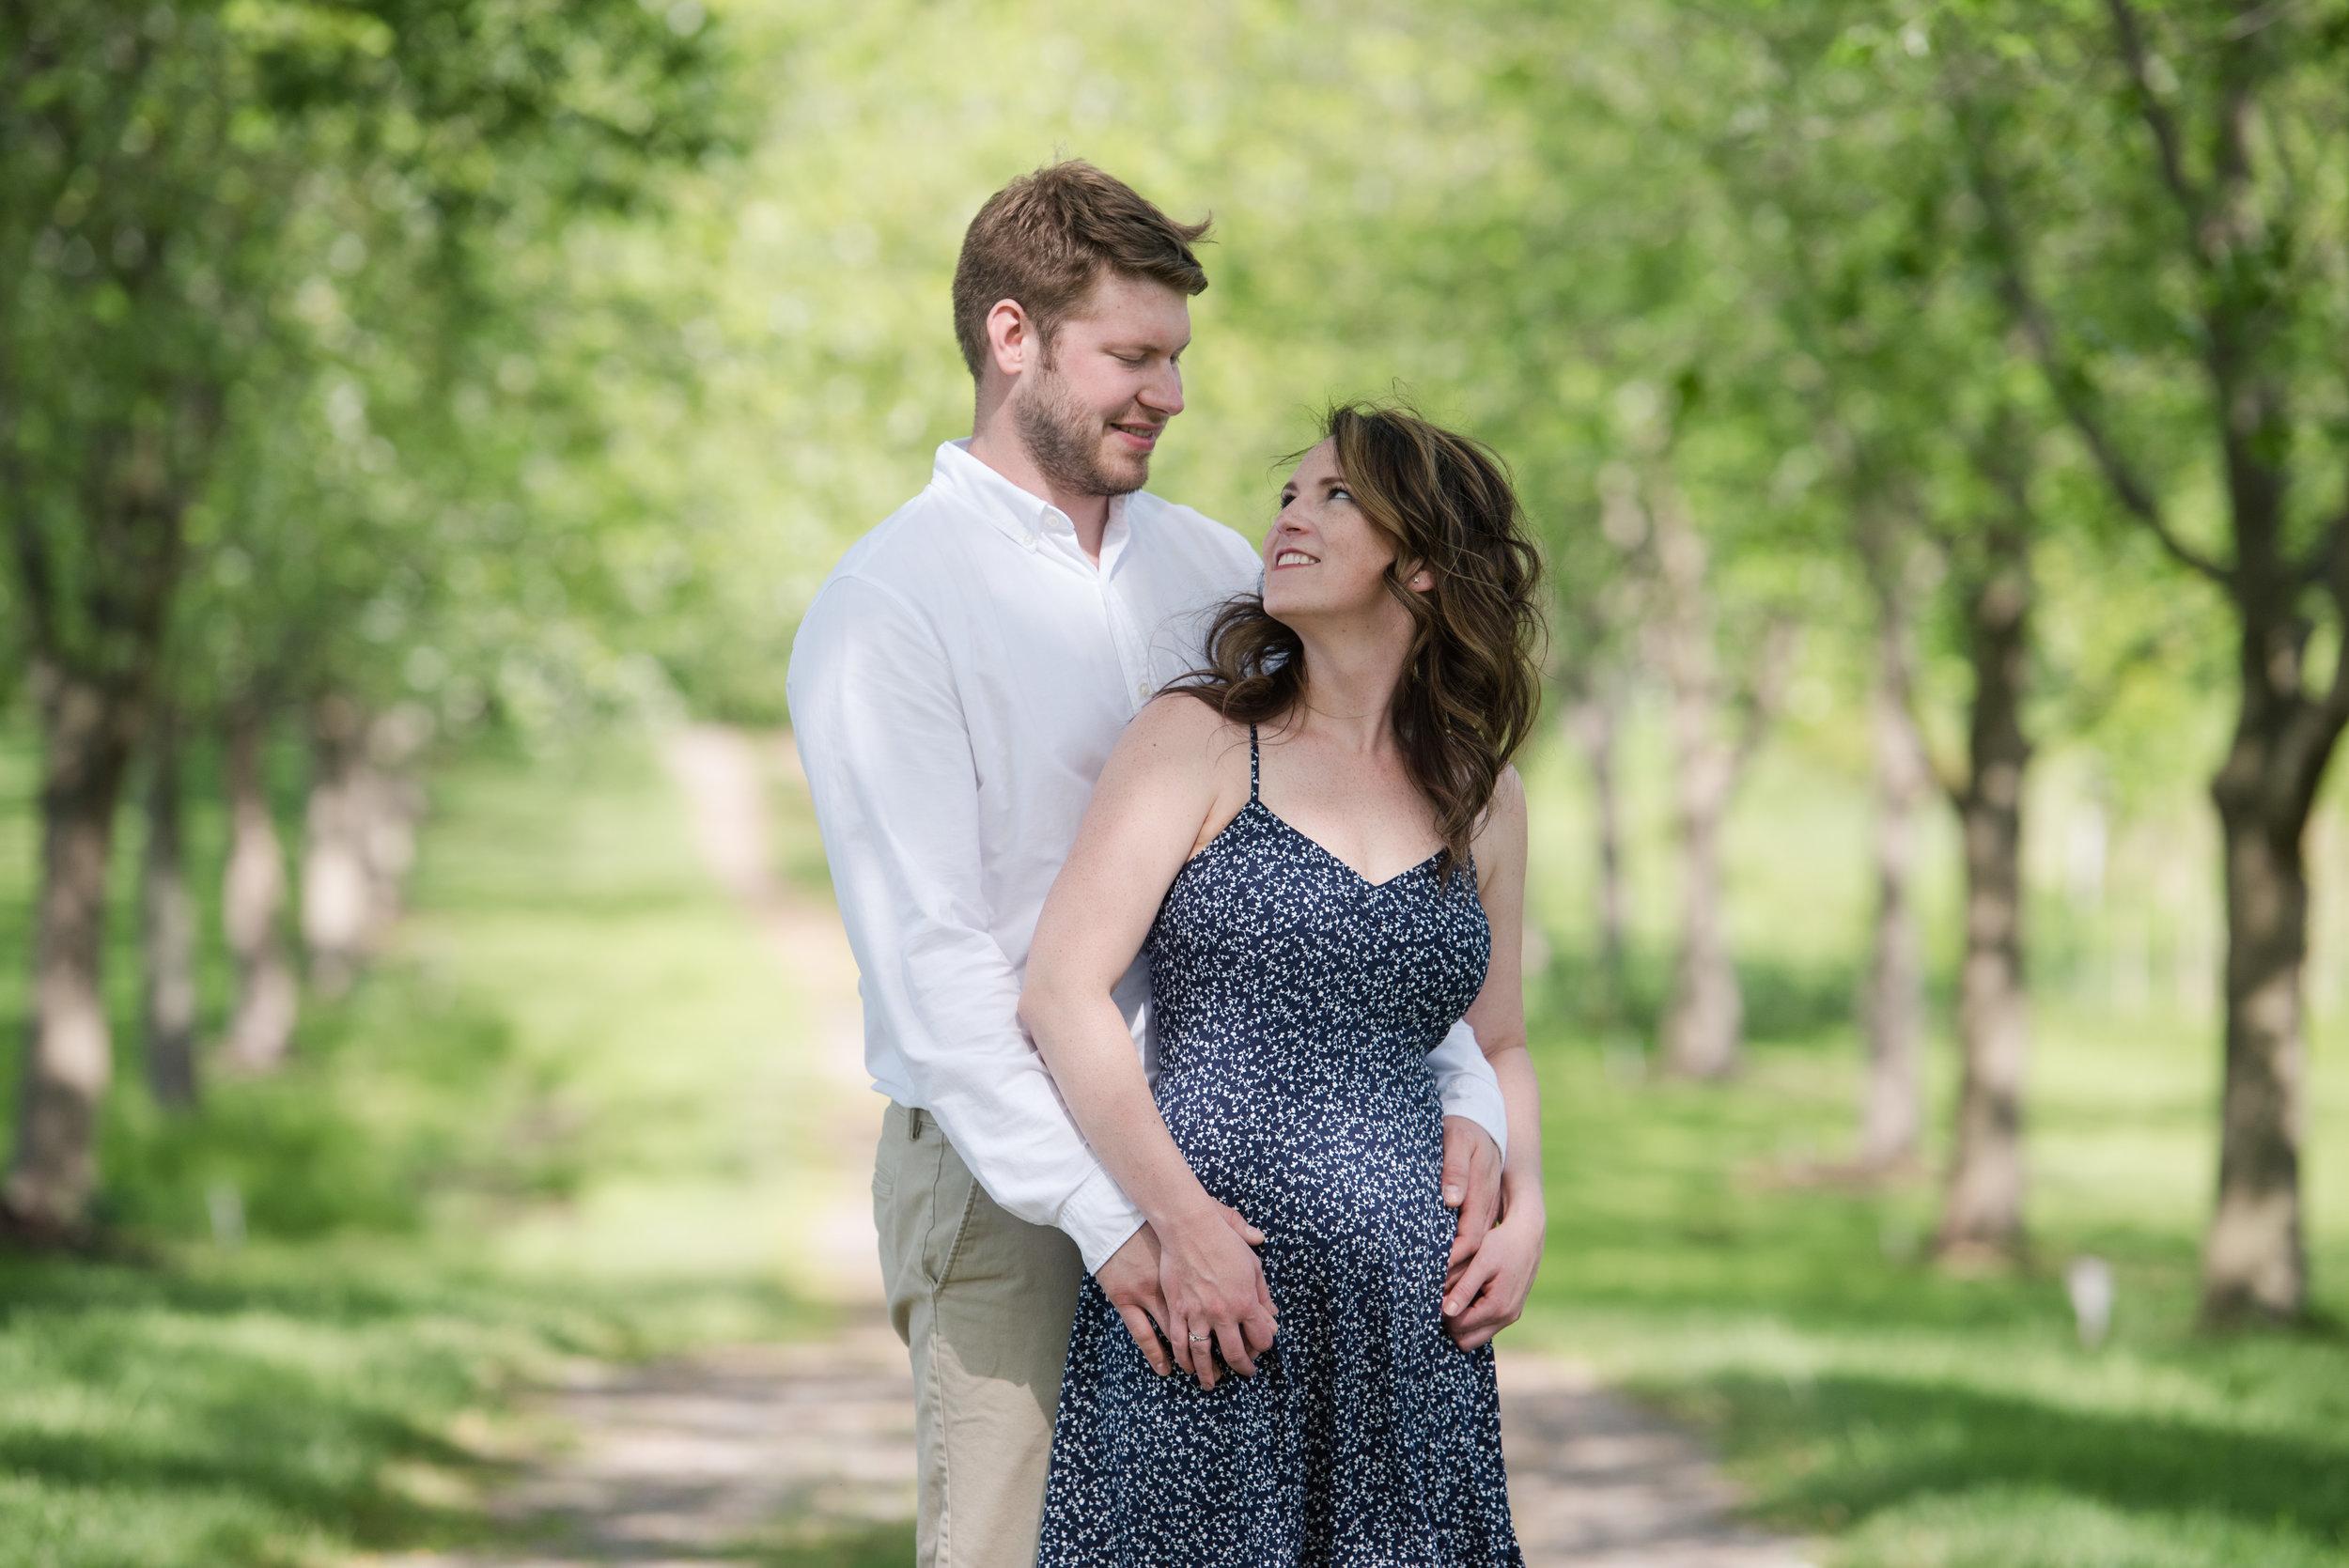 GALLERY-2019-6-9 Kaitlin, Justin & Liam Engagement 0857 127.jpg